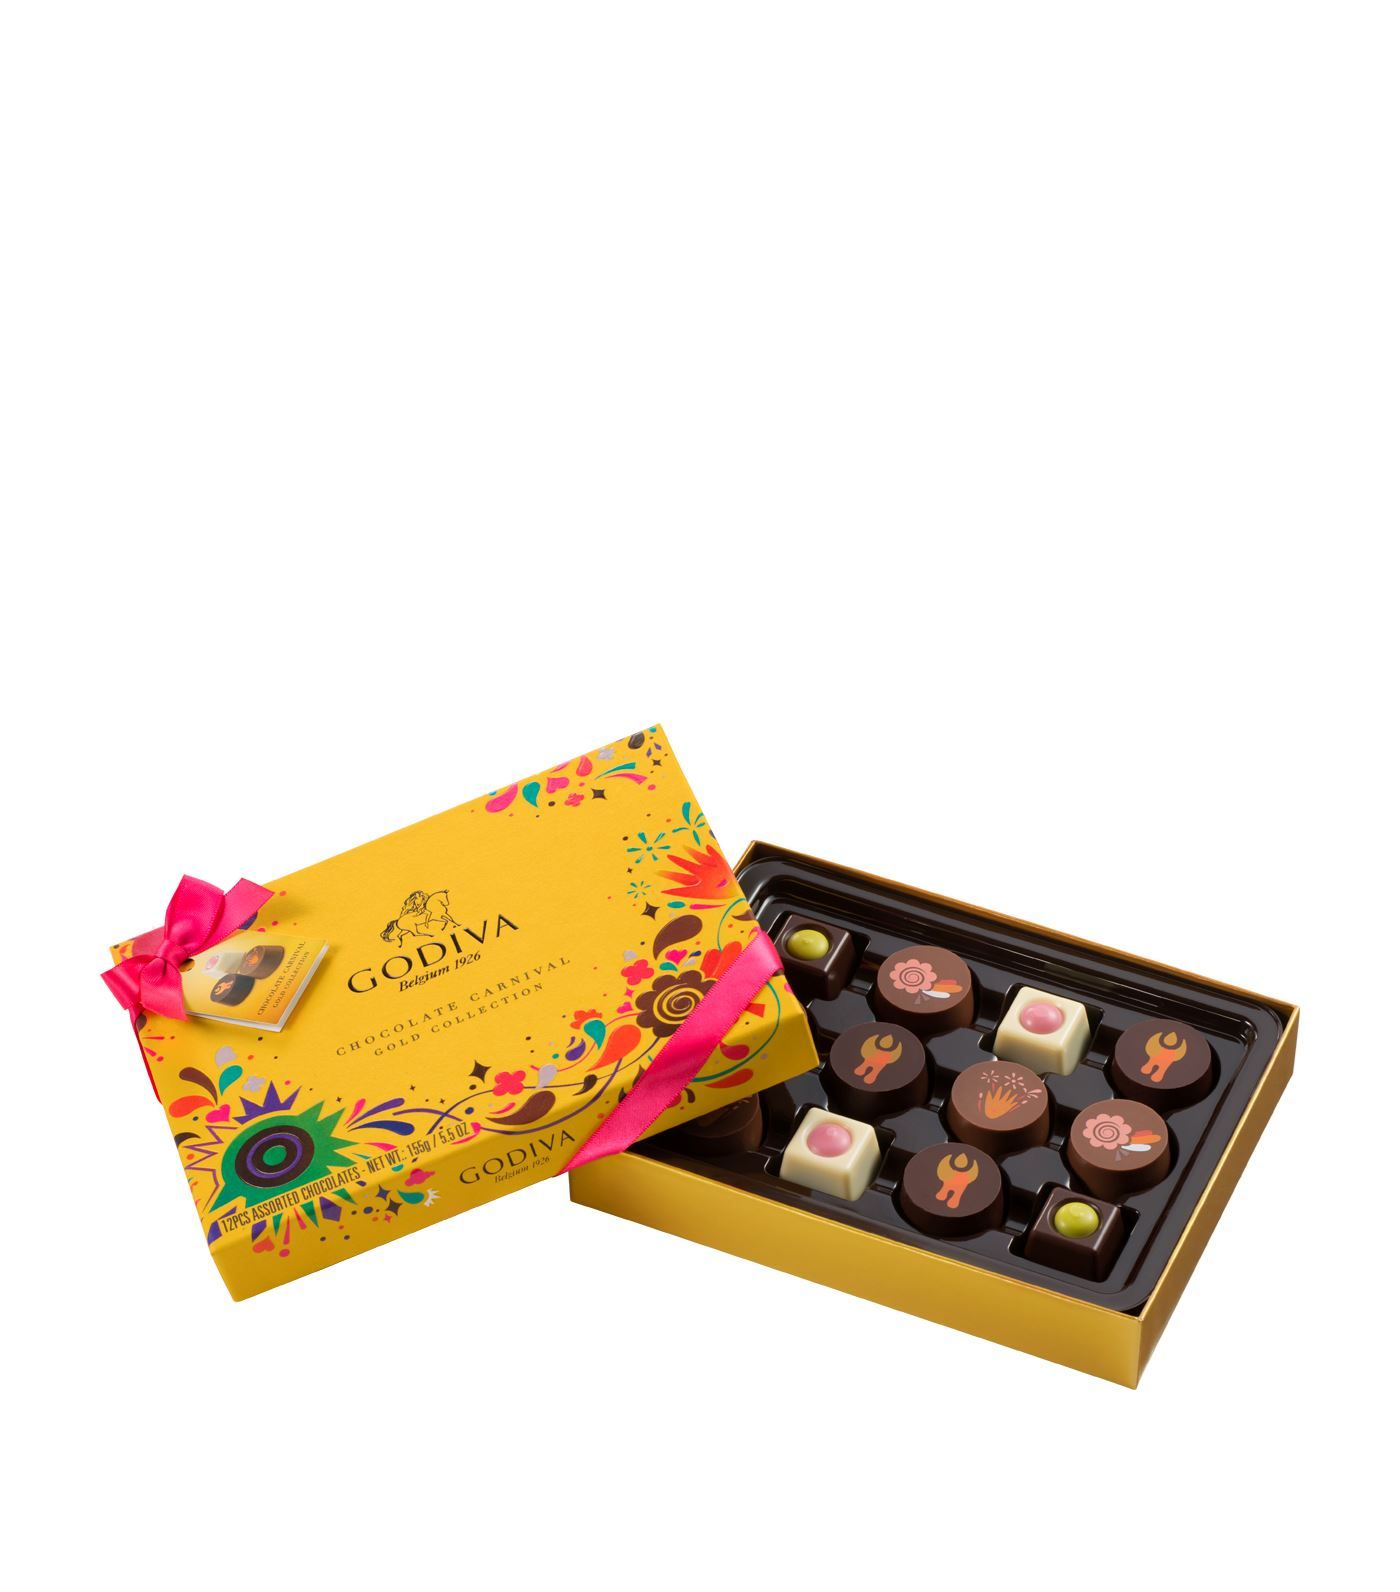 12 Piece Carnival Gold Chocolate Box 155g Chocolate Box